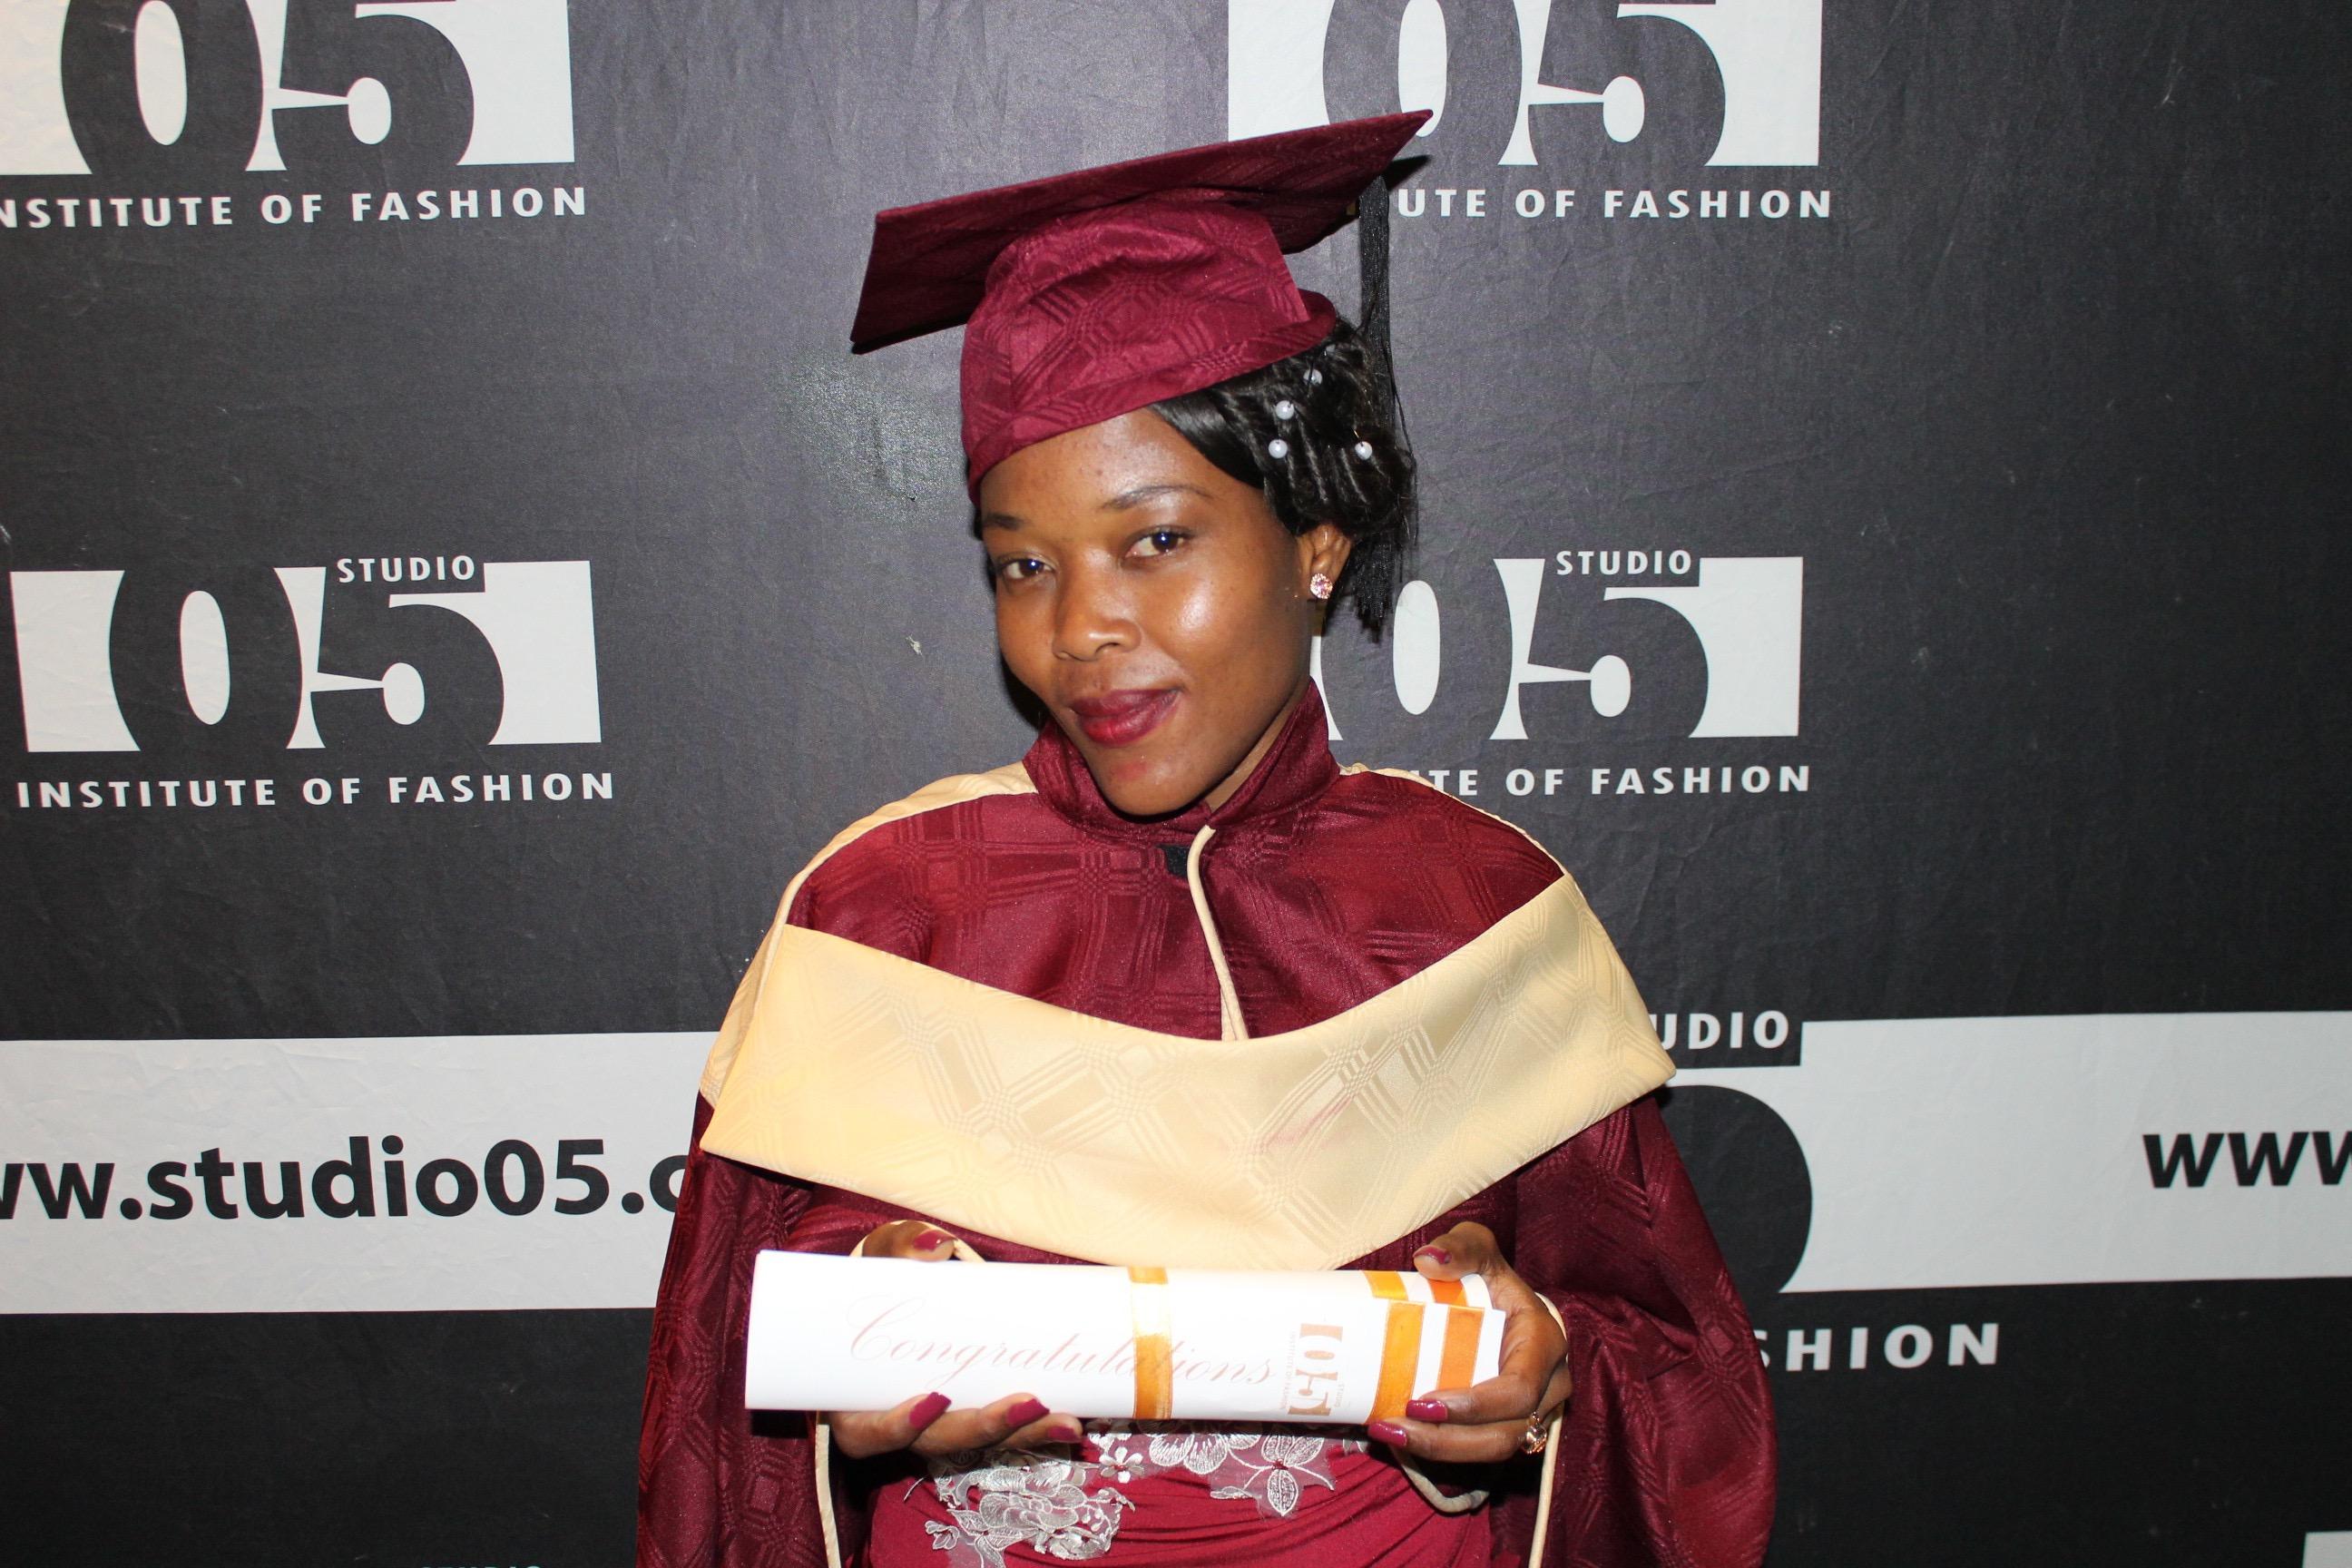 Graduate 9